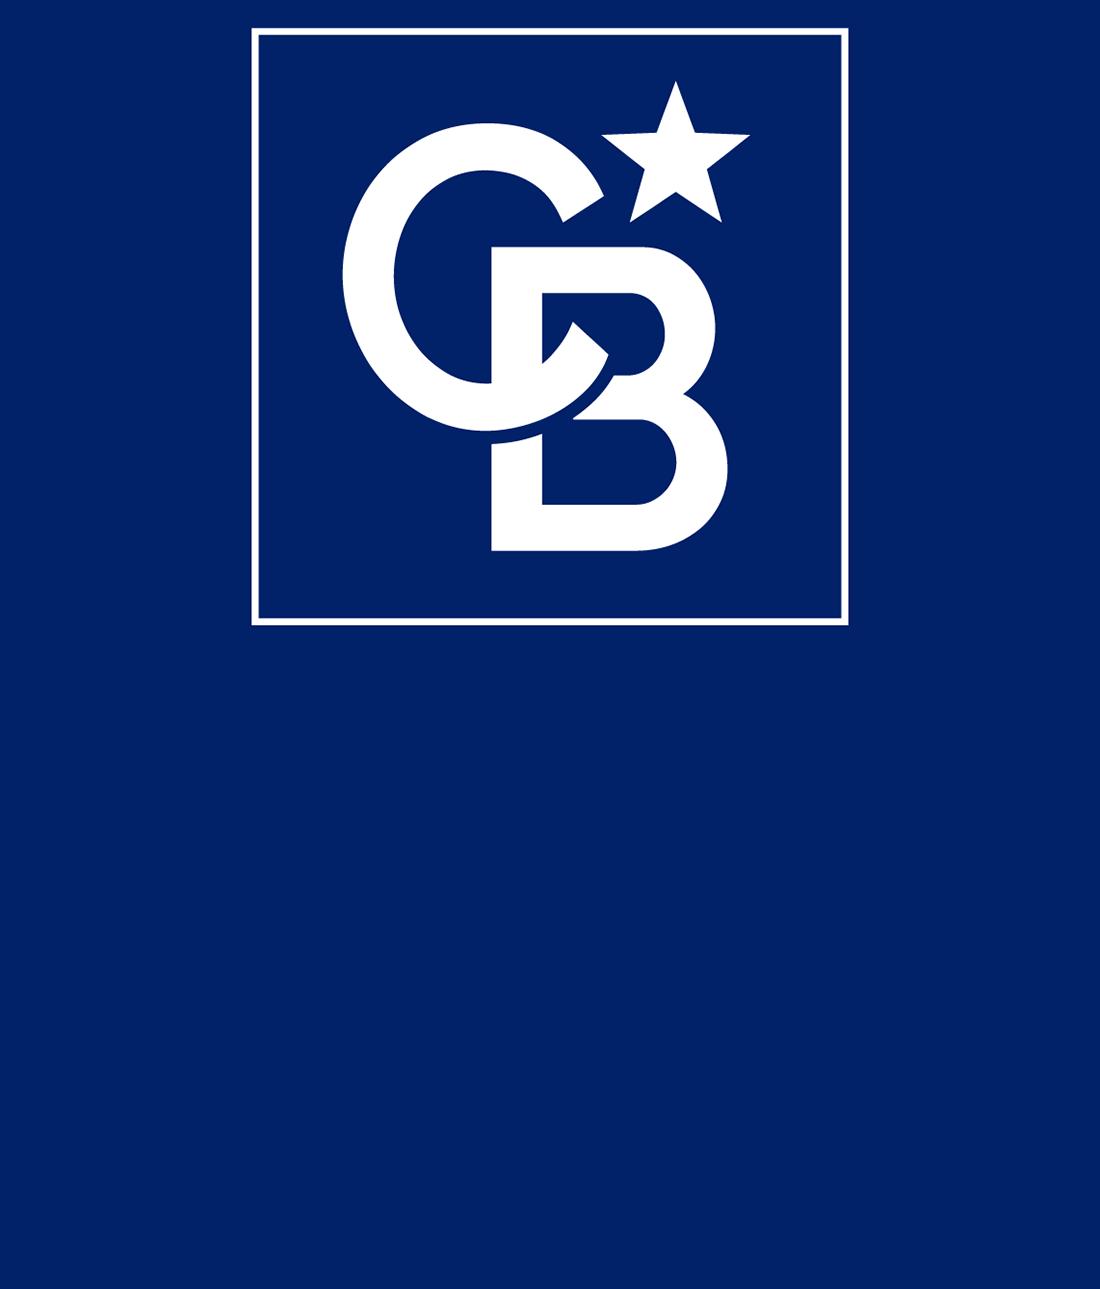 cbhs03 Logo